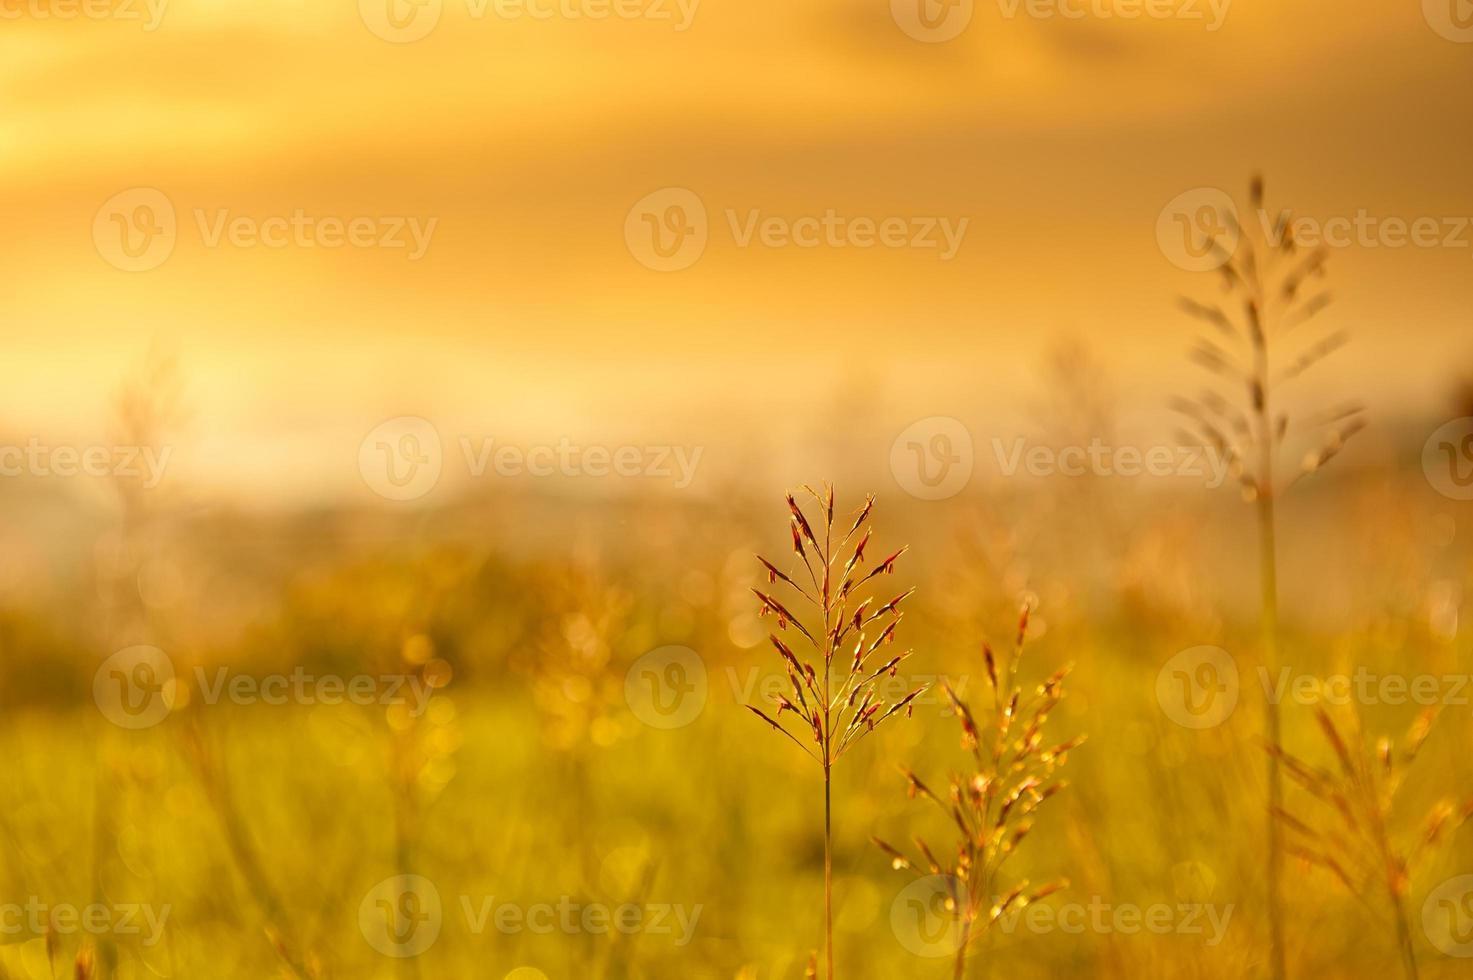 Grasfahnen bei Sonnenuntergang foto